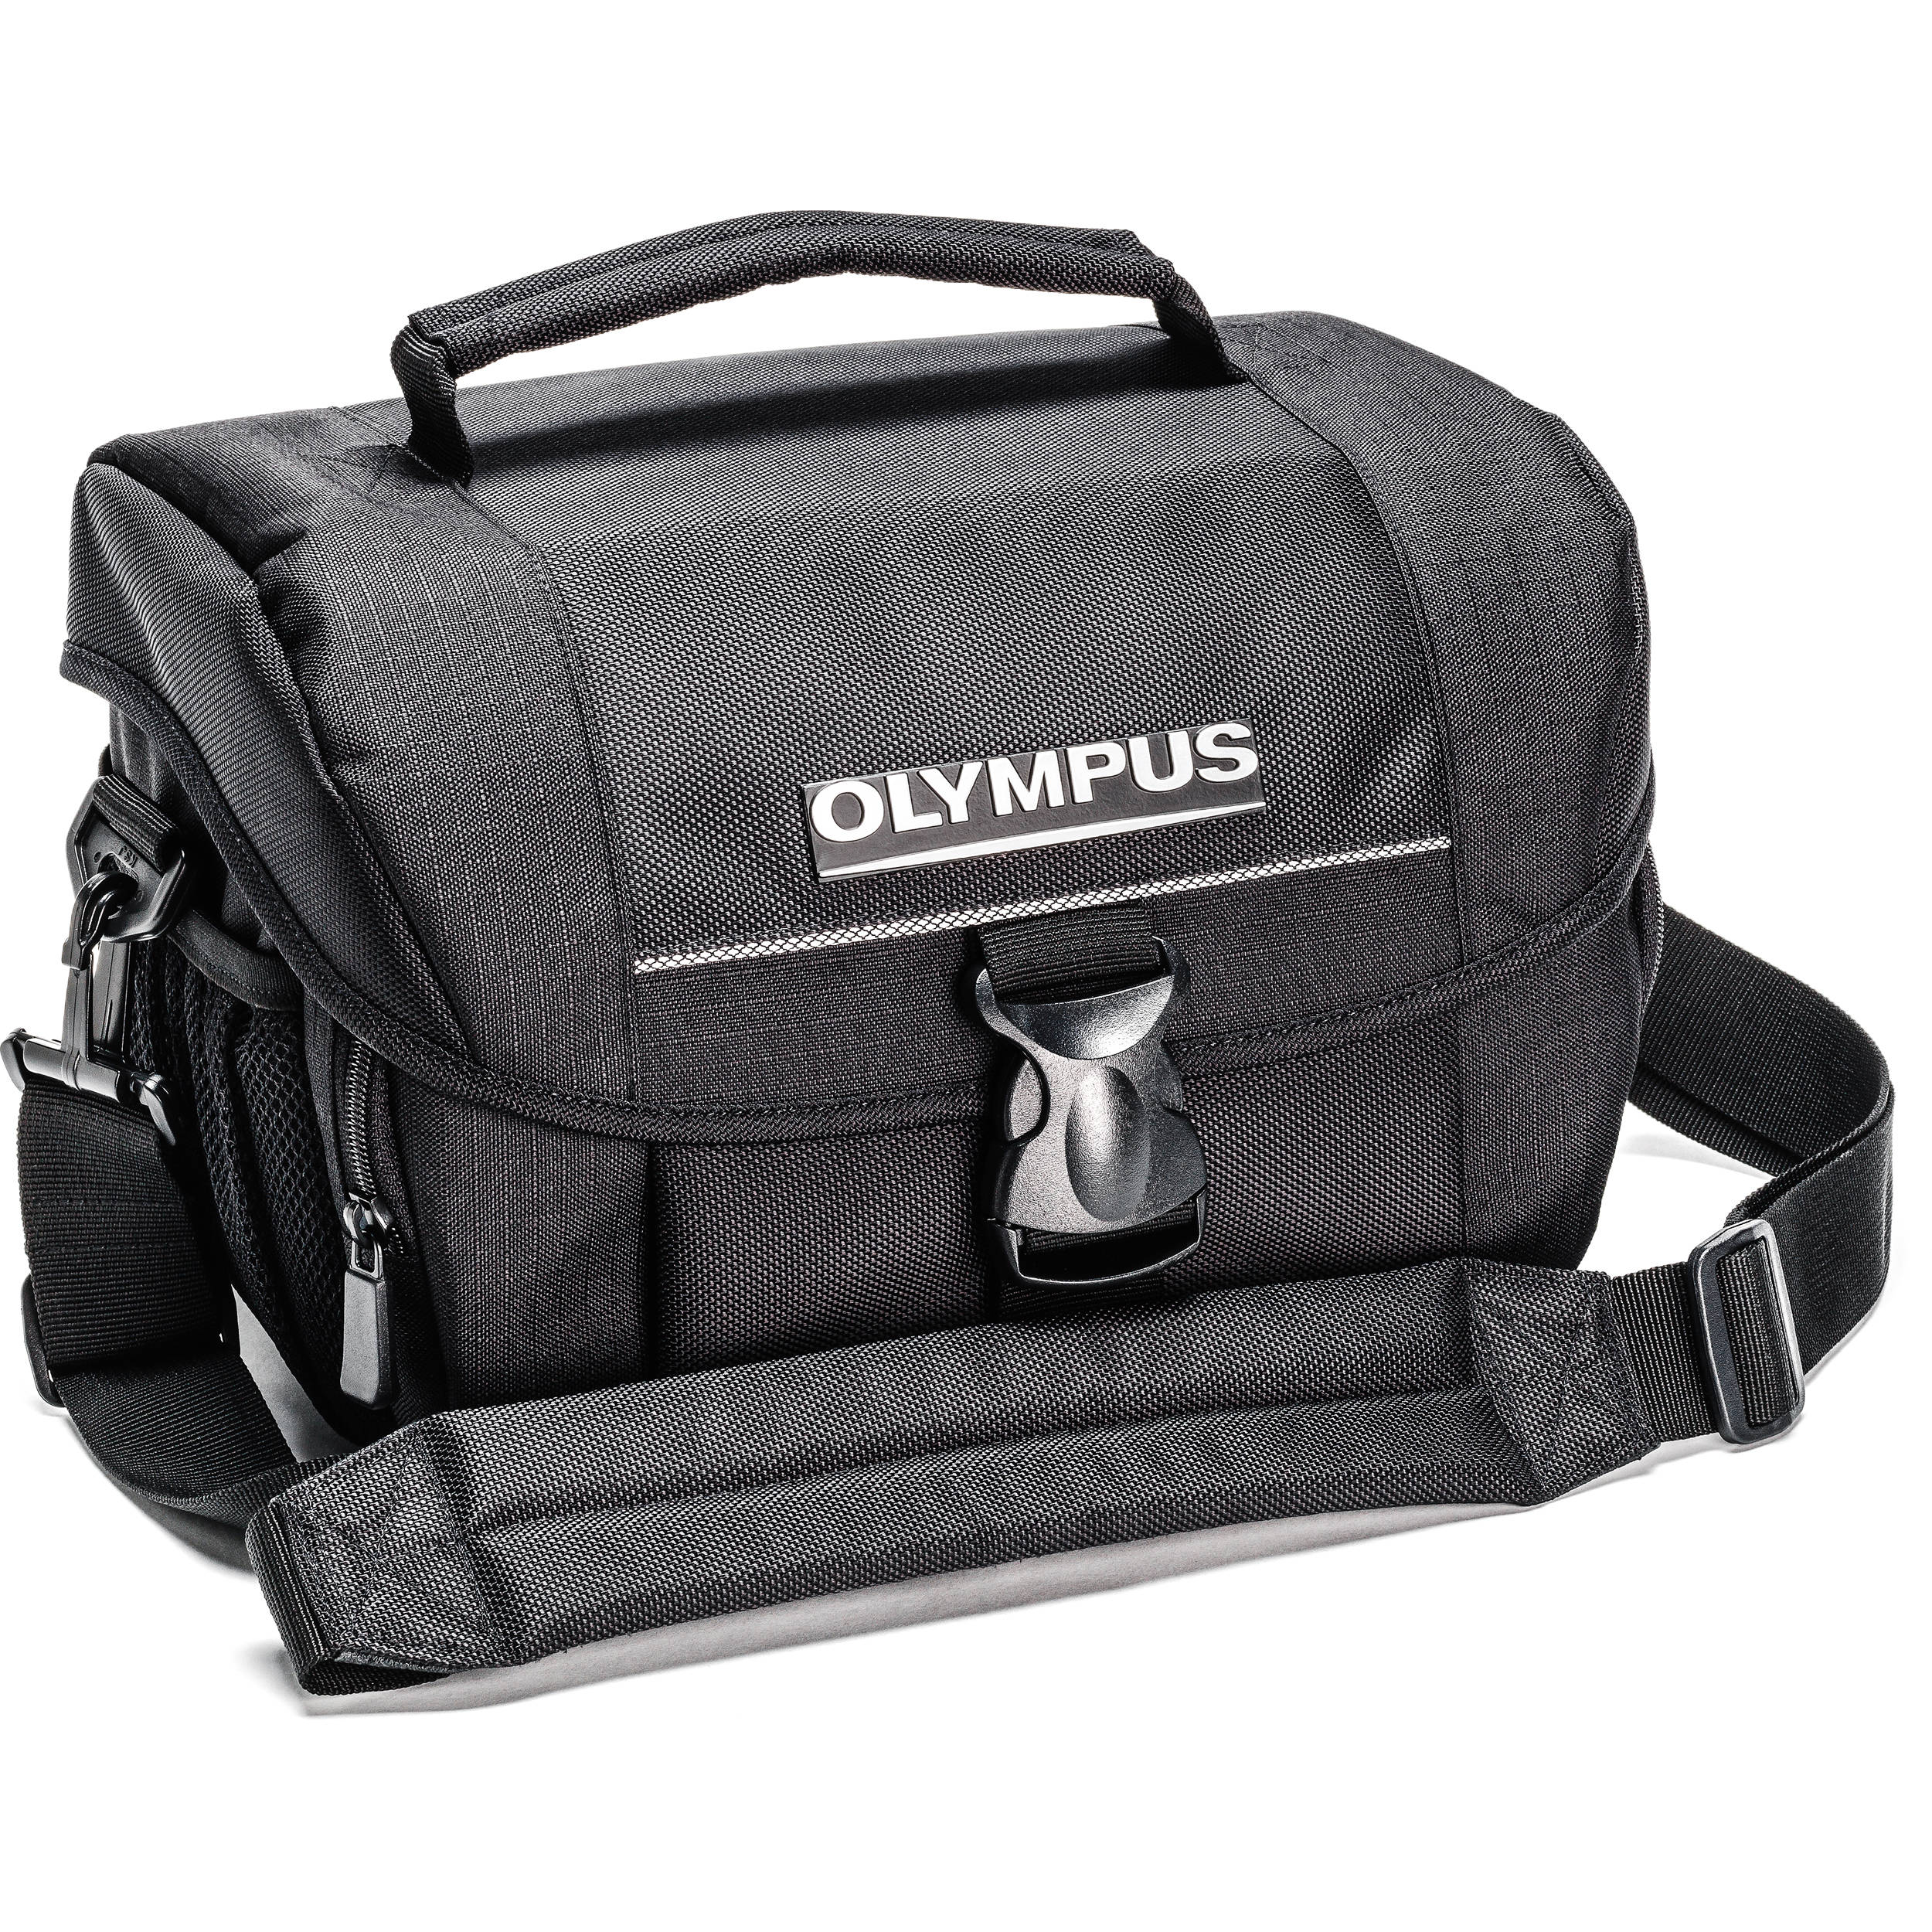 Olympus Pro System Camera Bag 260617 B Amp H Photo Video